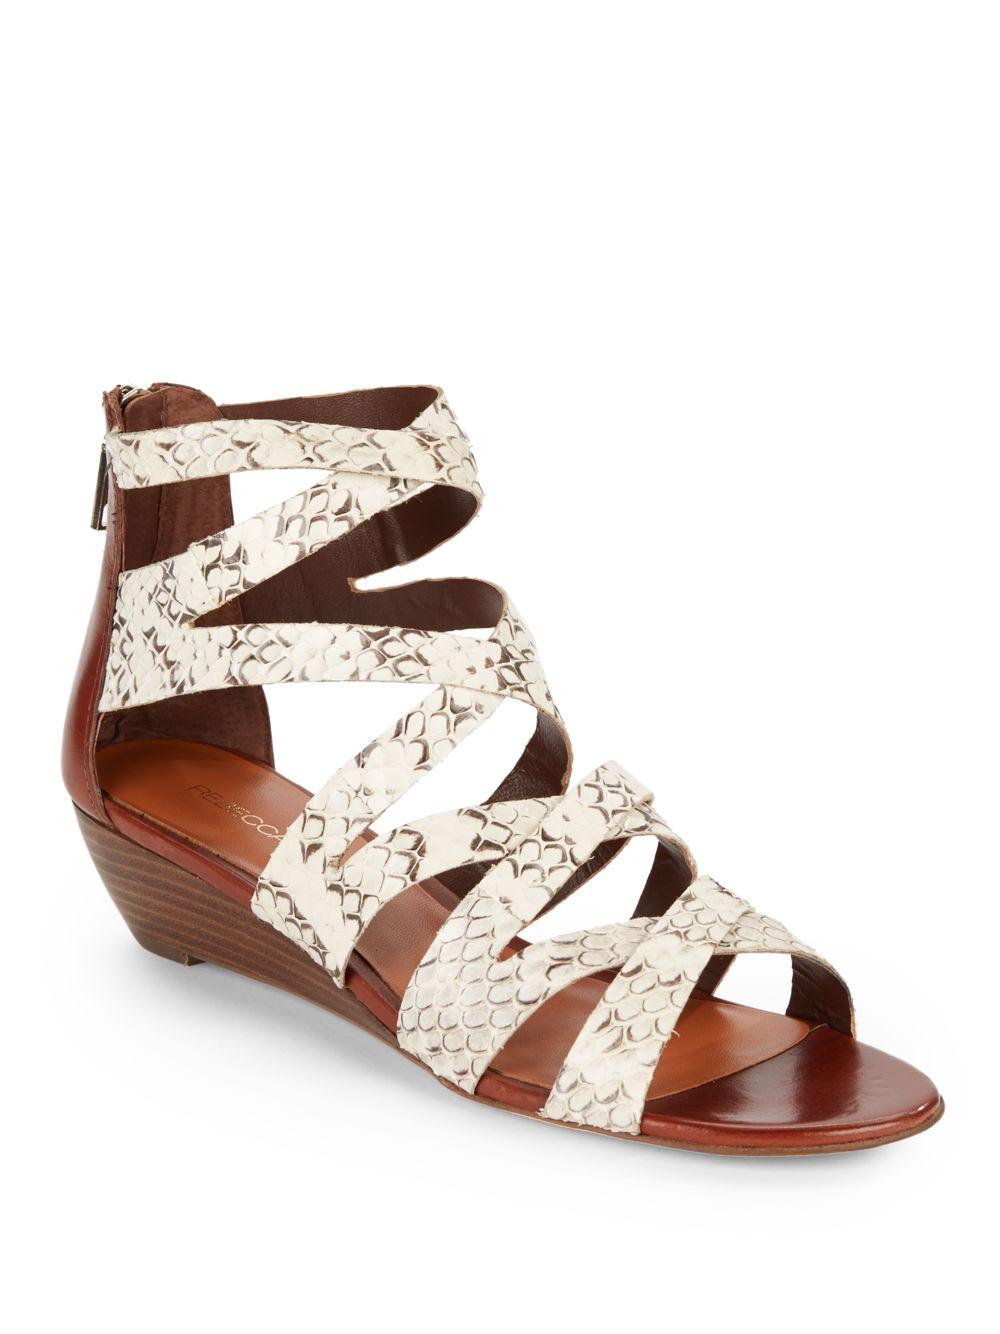 minkoff bonnie snakeembossed low wedge sandals in